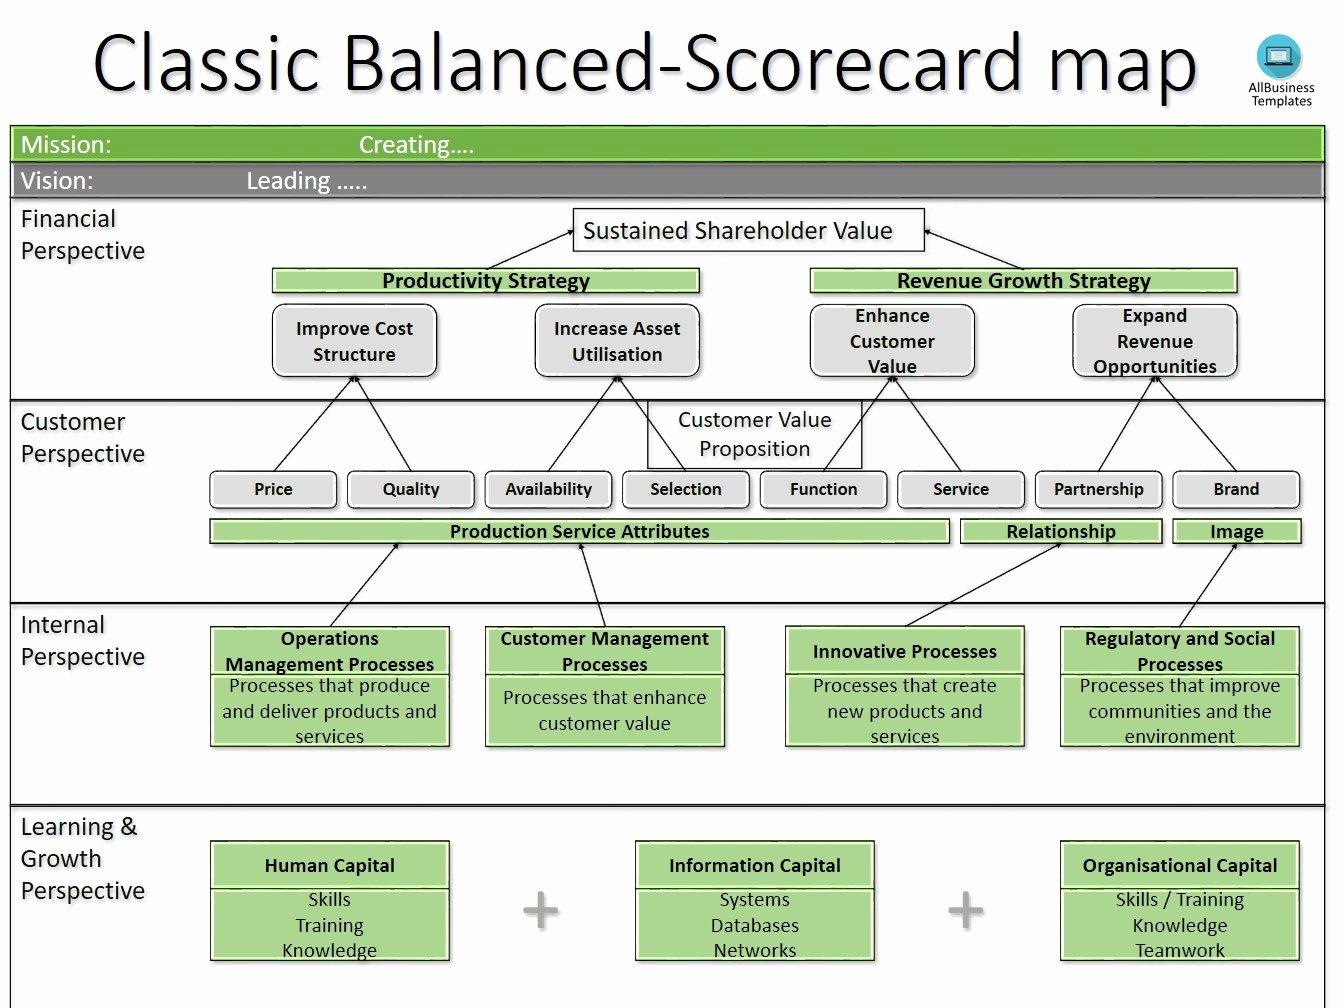 Balanced Scorecard Template Word Elegant the Balanced Scorecard Measures that Drive Performance